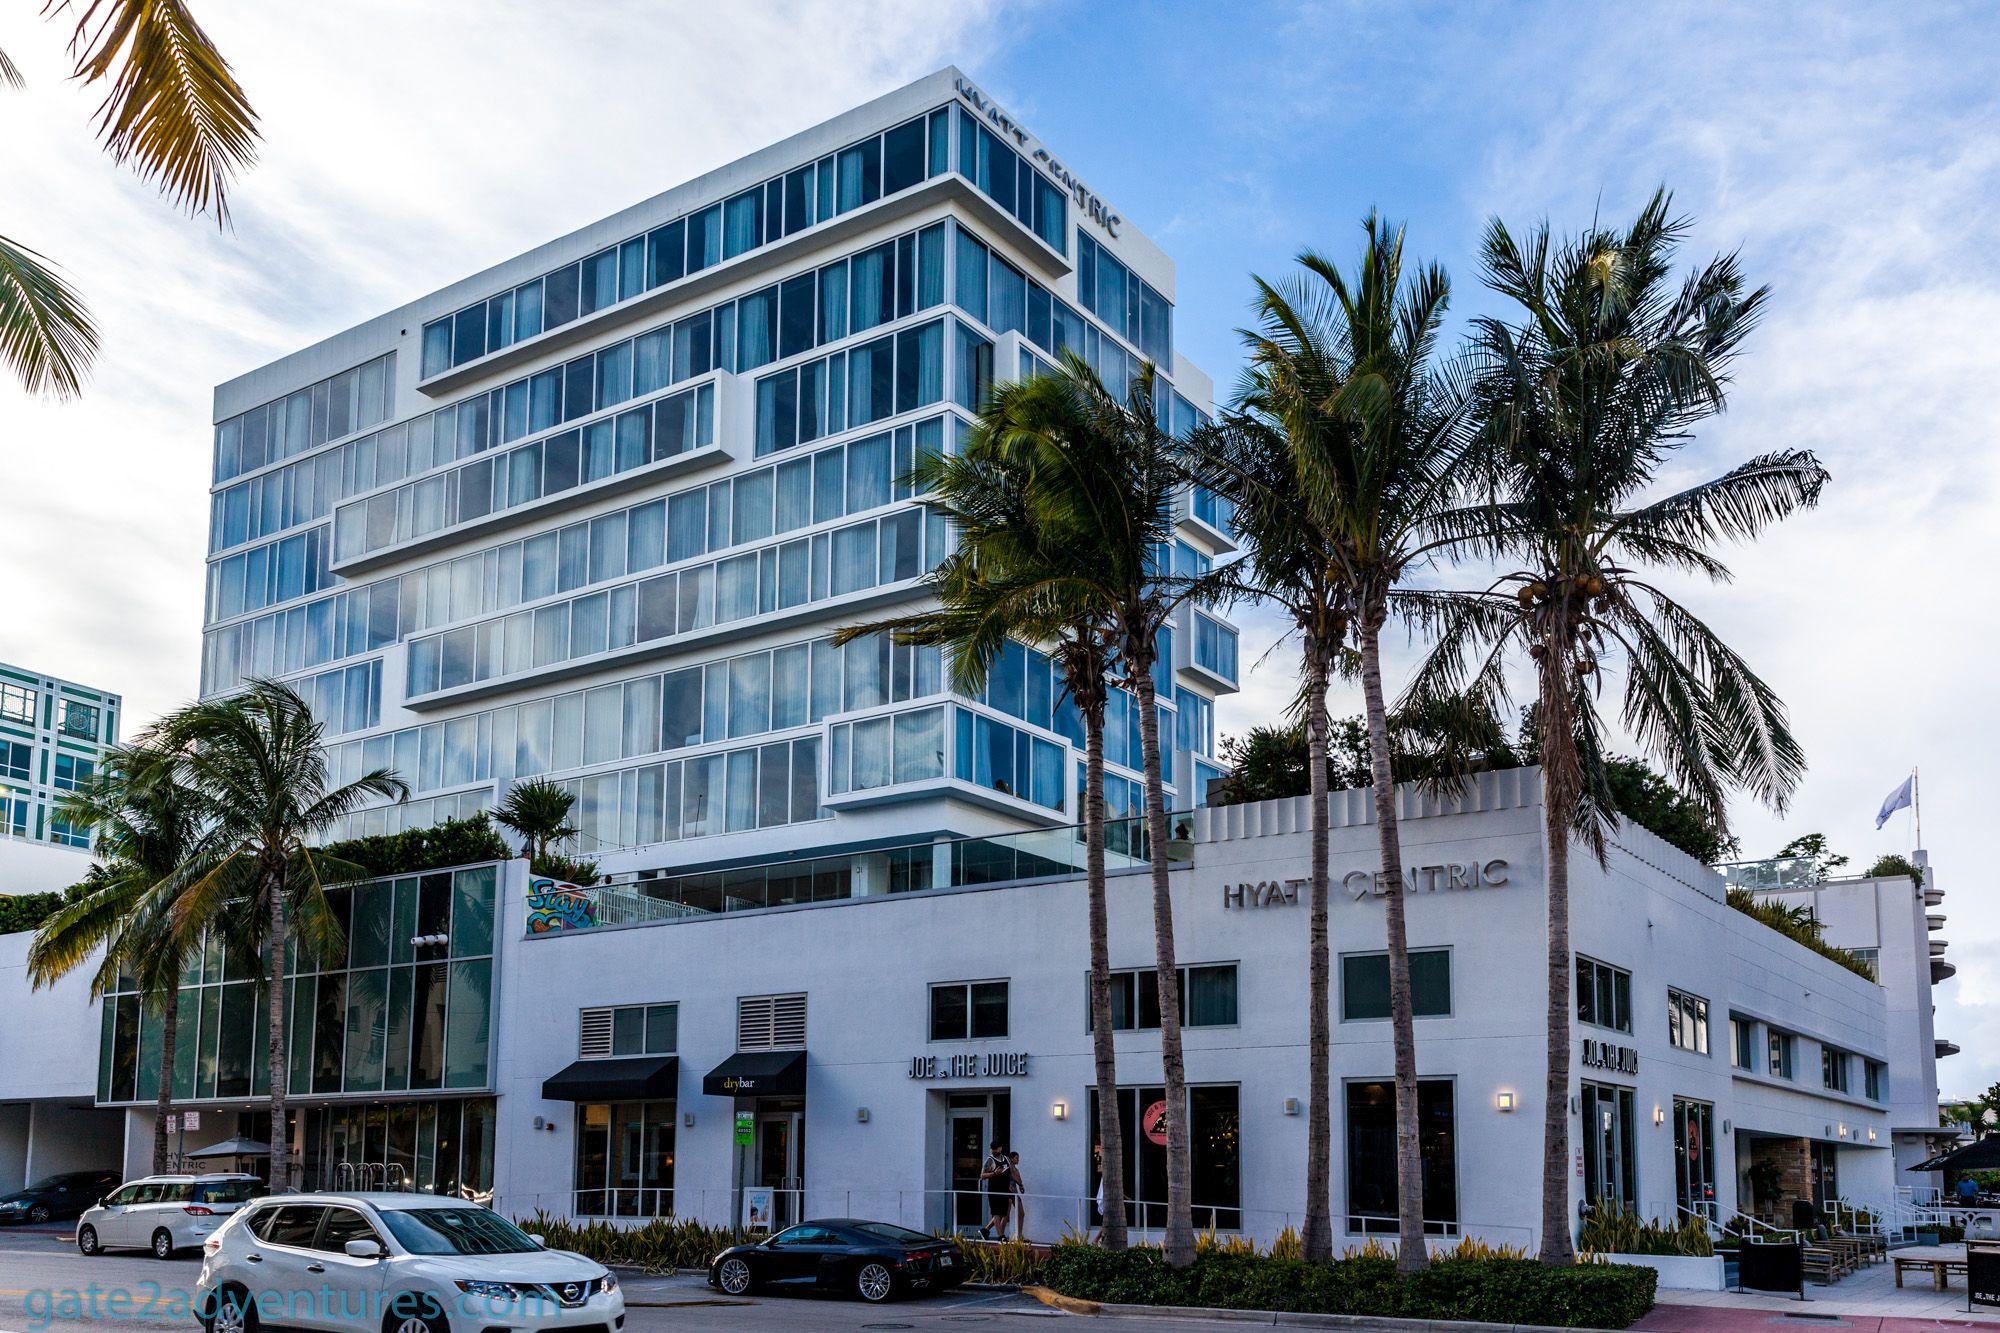 Hotel Review: Hyatt Centric South Beach Miami